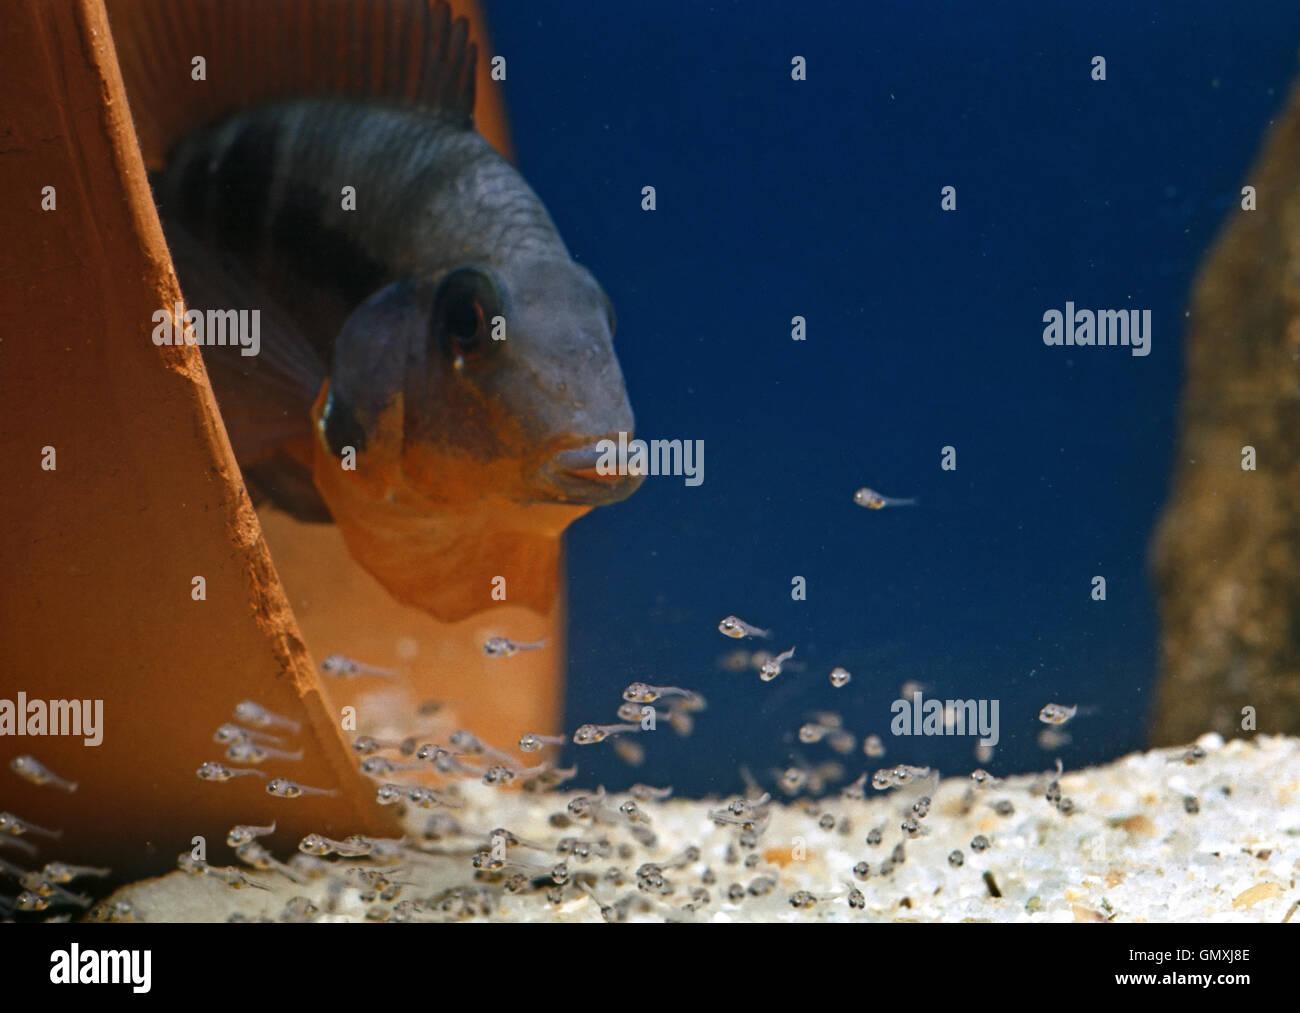 Firemouth cichlid, Thorichthys meeki. Male guarding brood. Aquarium. Portugal. - Stock Image